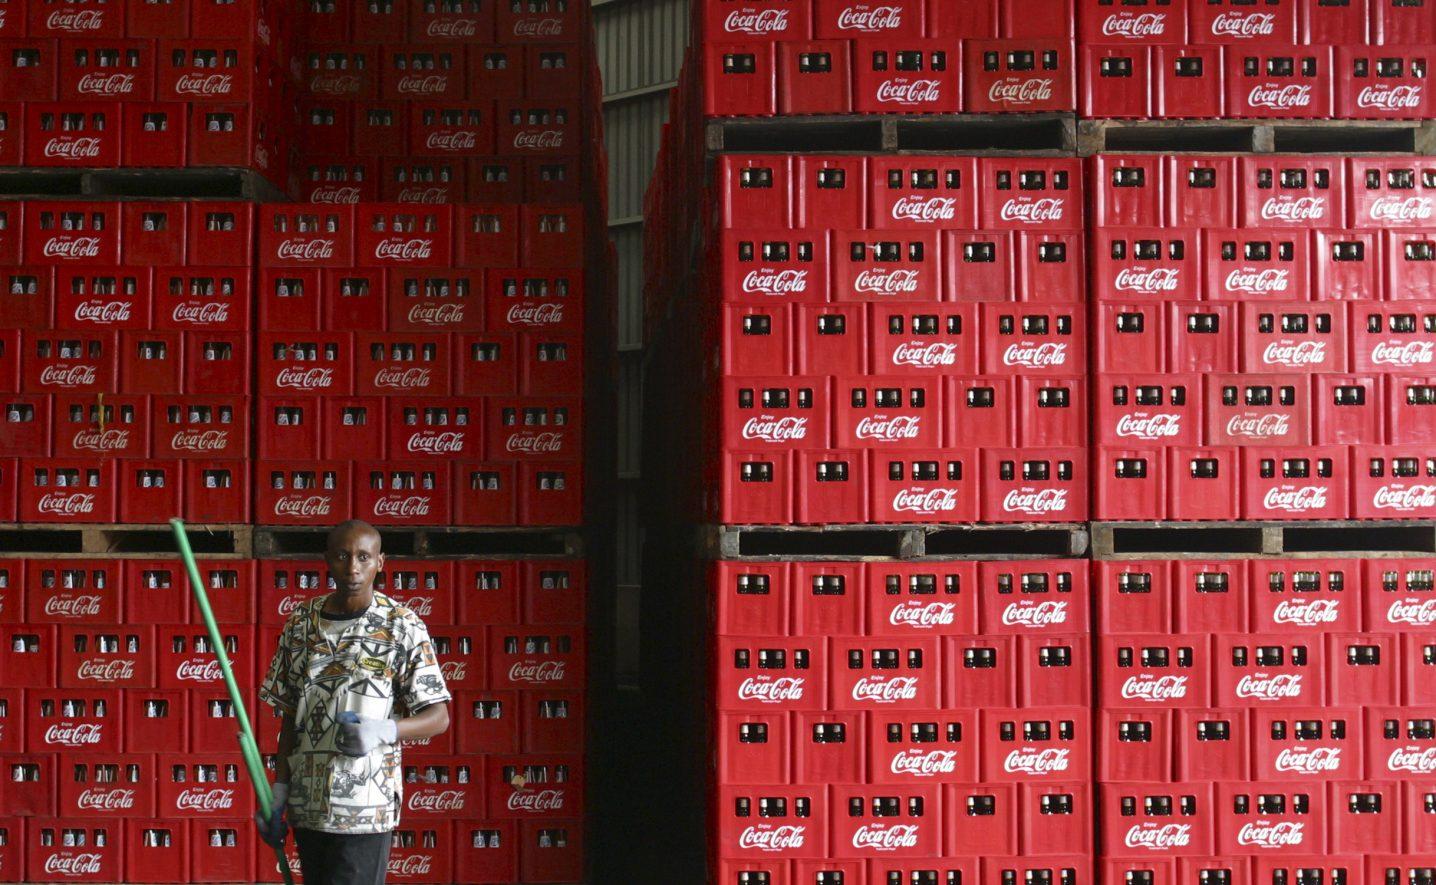 A Coca Cola processing plant in Nairobi, Kenya.